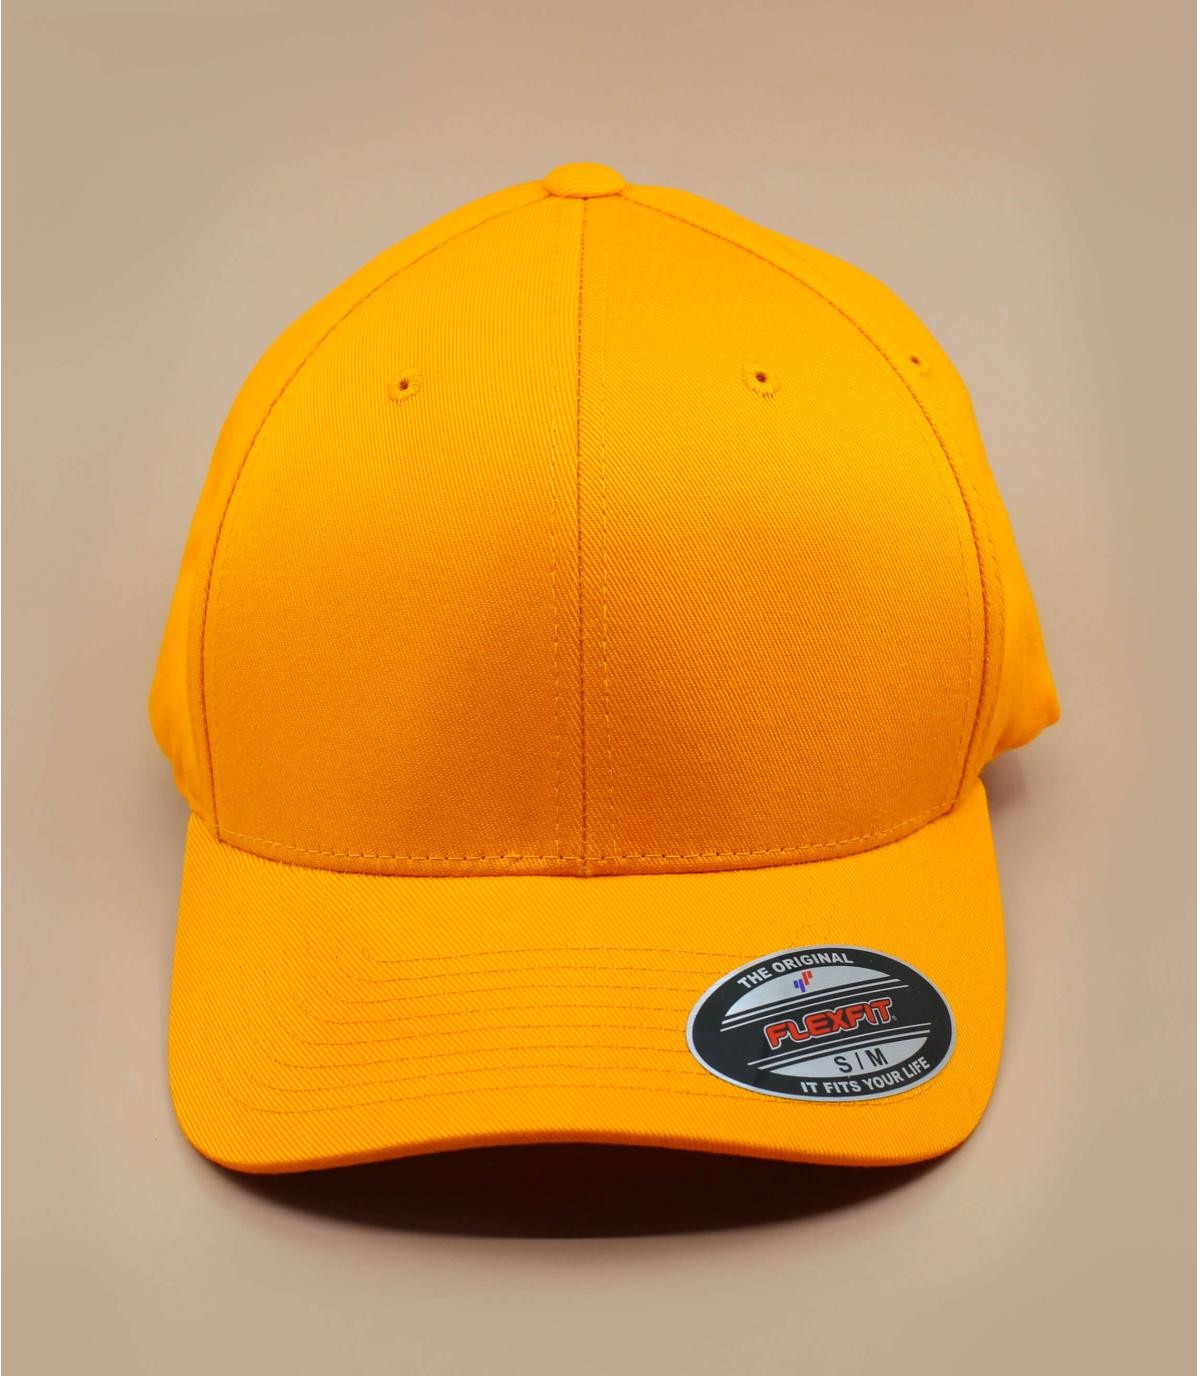 Flexfit cap yellow